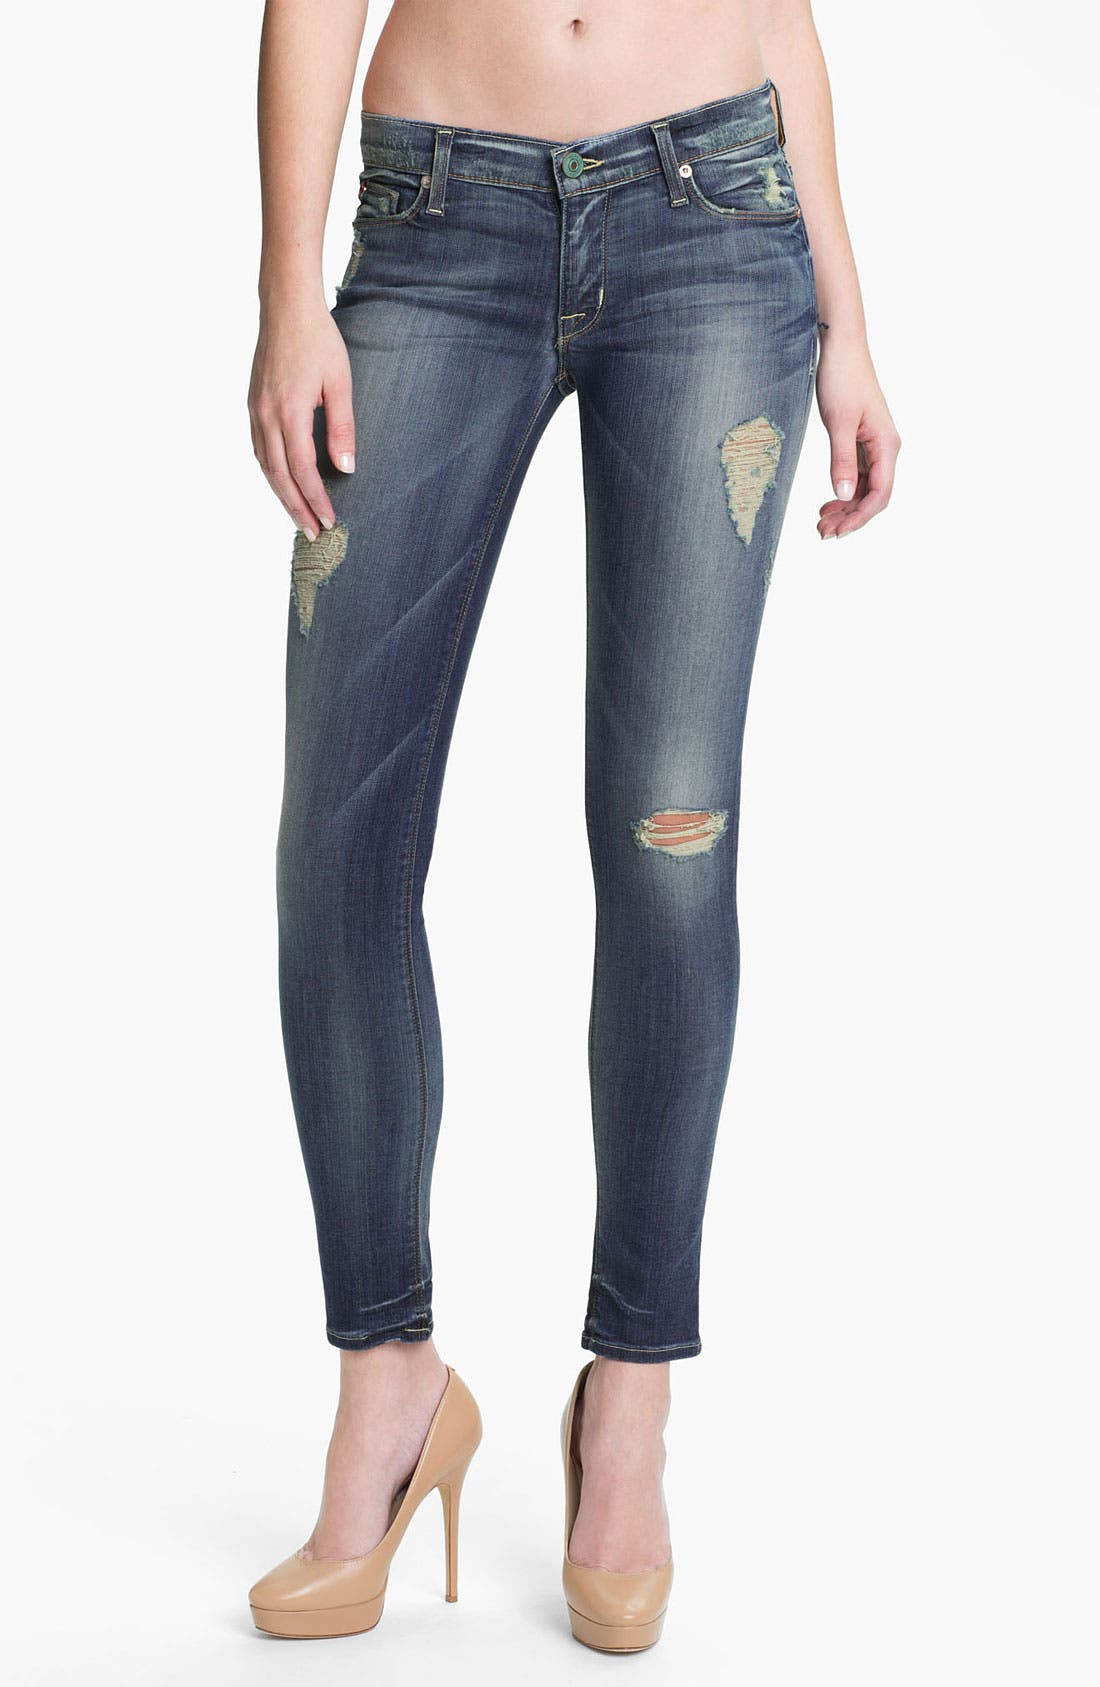 Main Image - Hudson Jeans 'Krista' Super Skinny Jeans (Blondie)